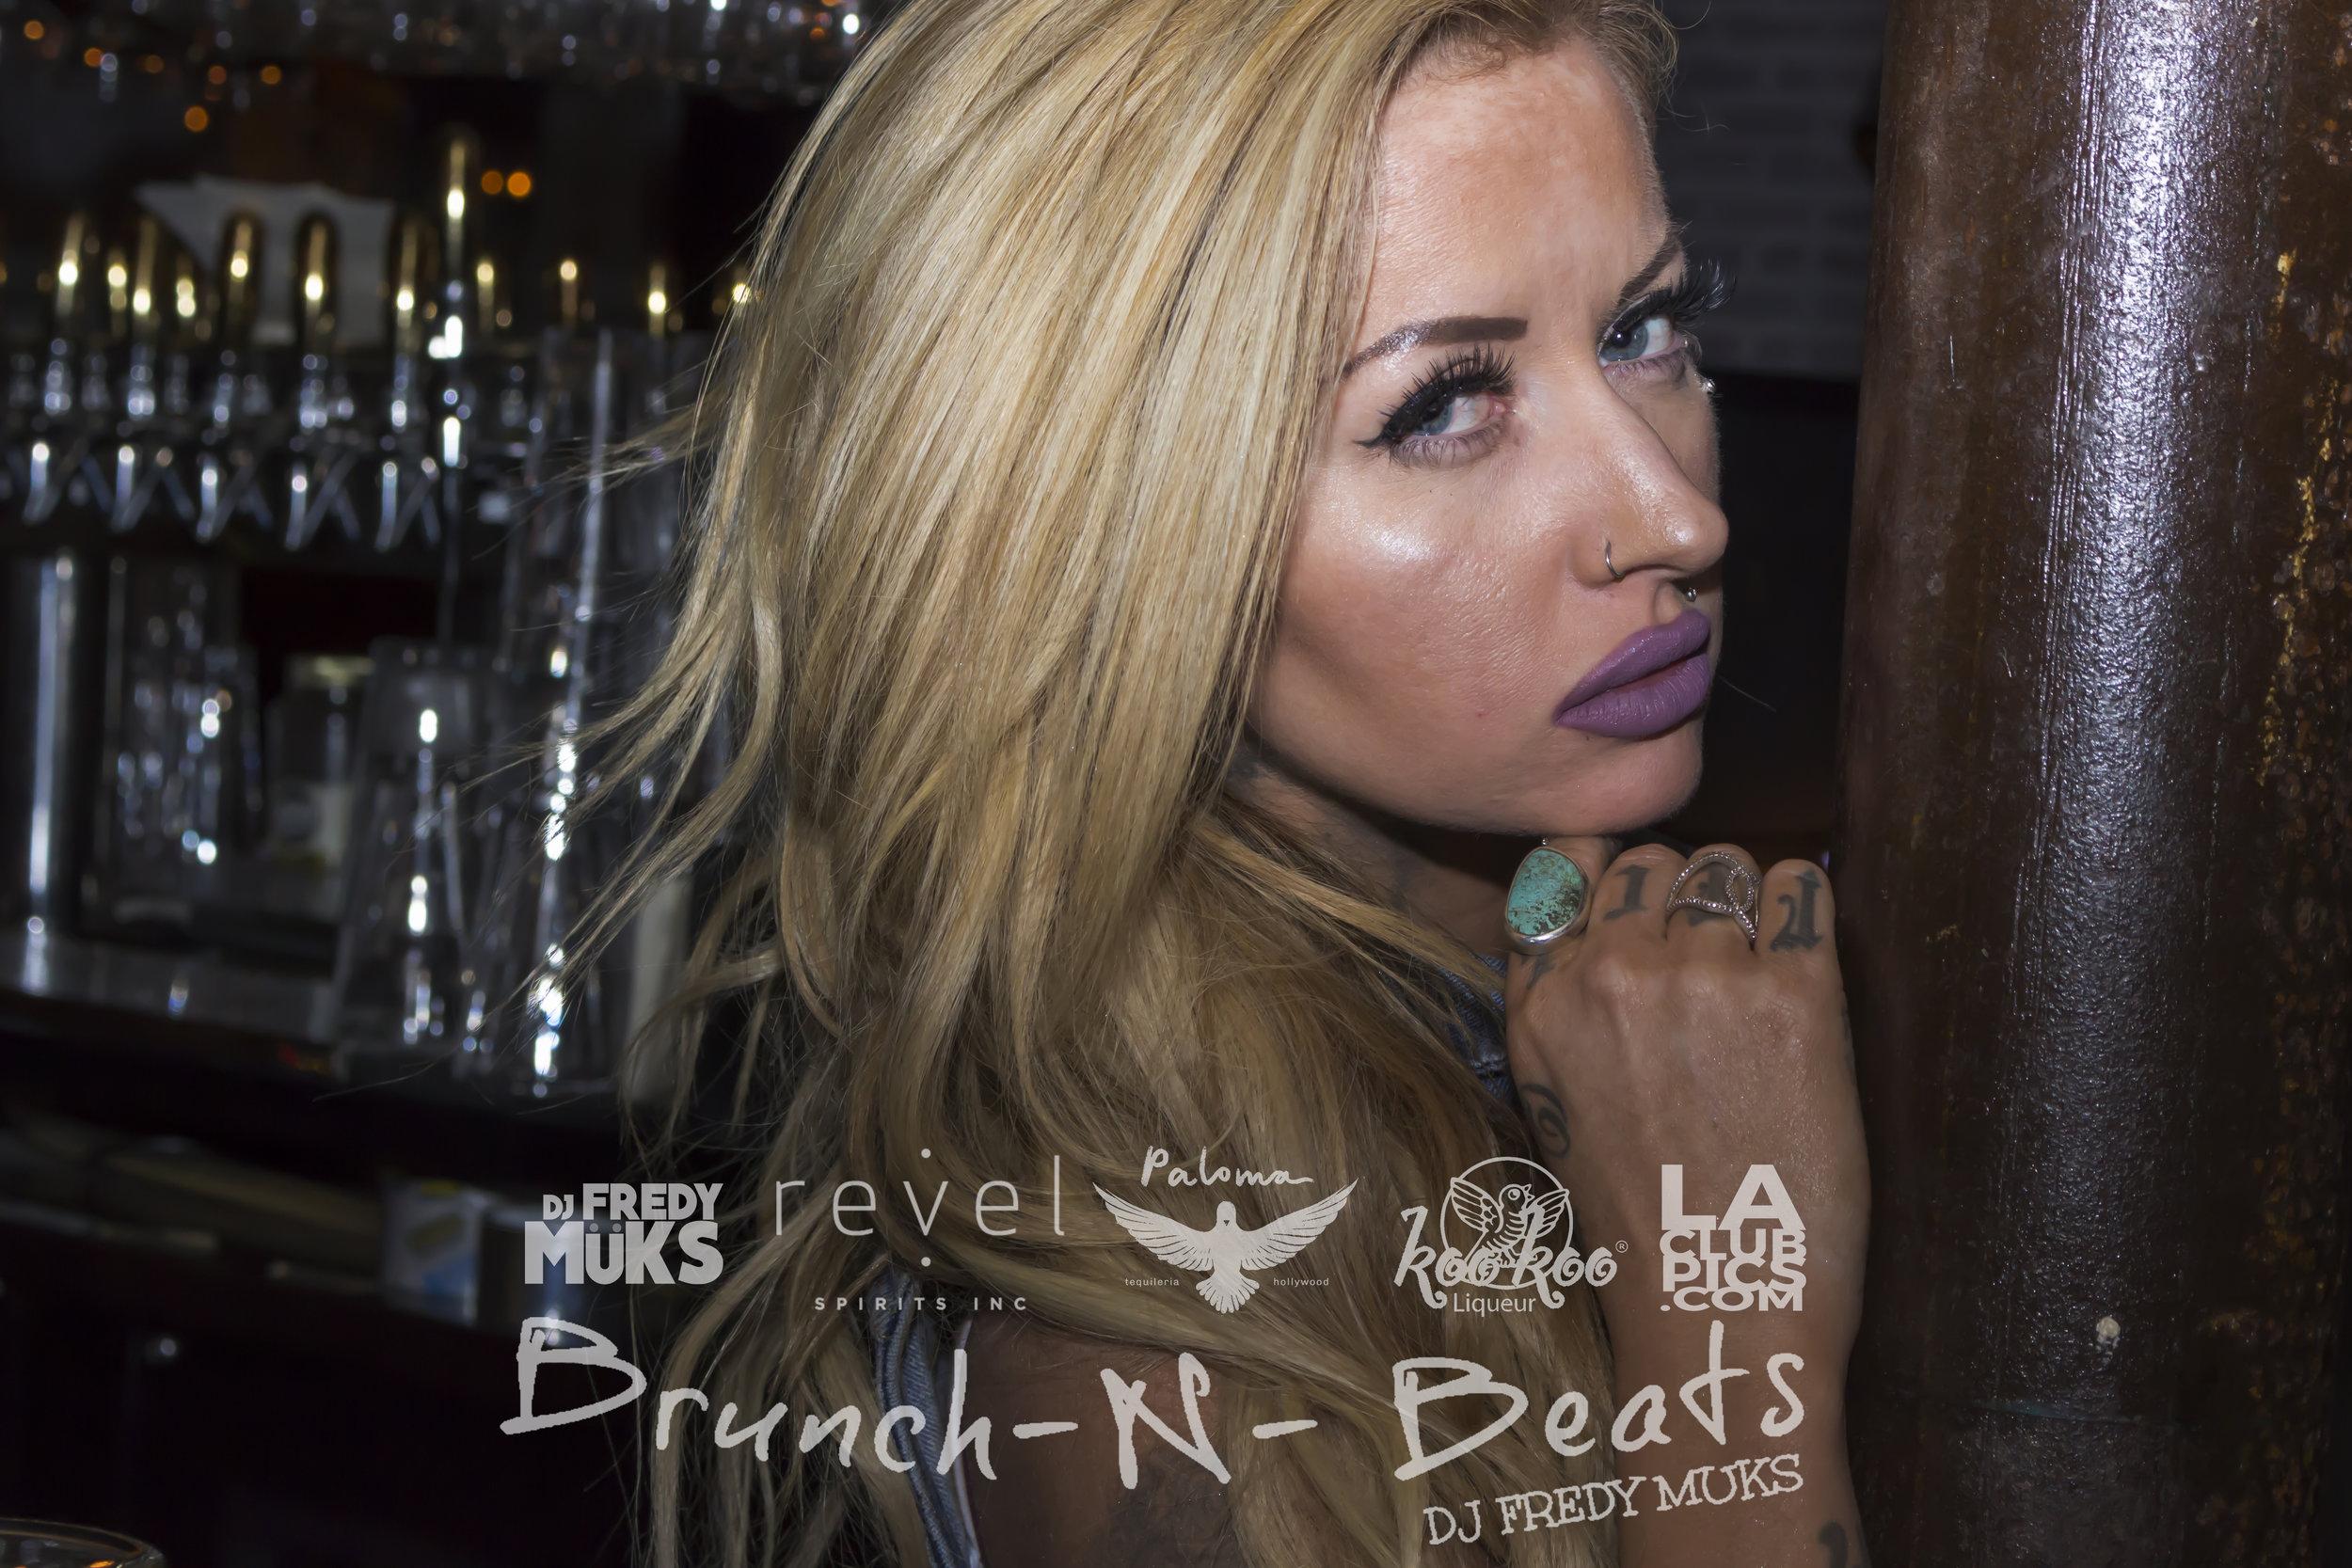 Brunch-N-Beats - Paloma Hollywood - 02-25-18_158.jpg